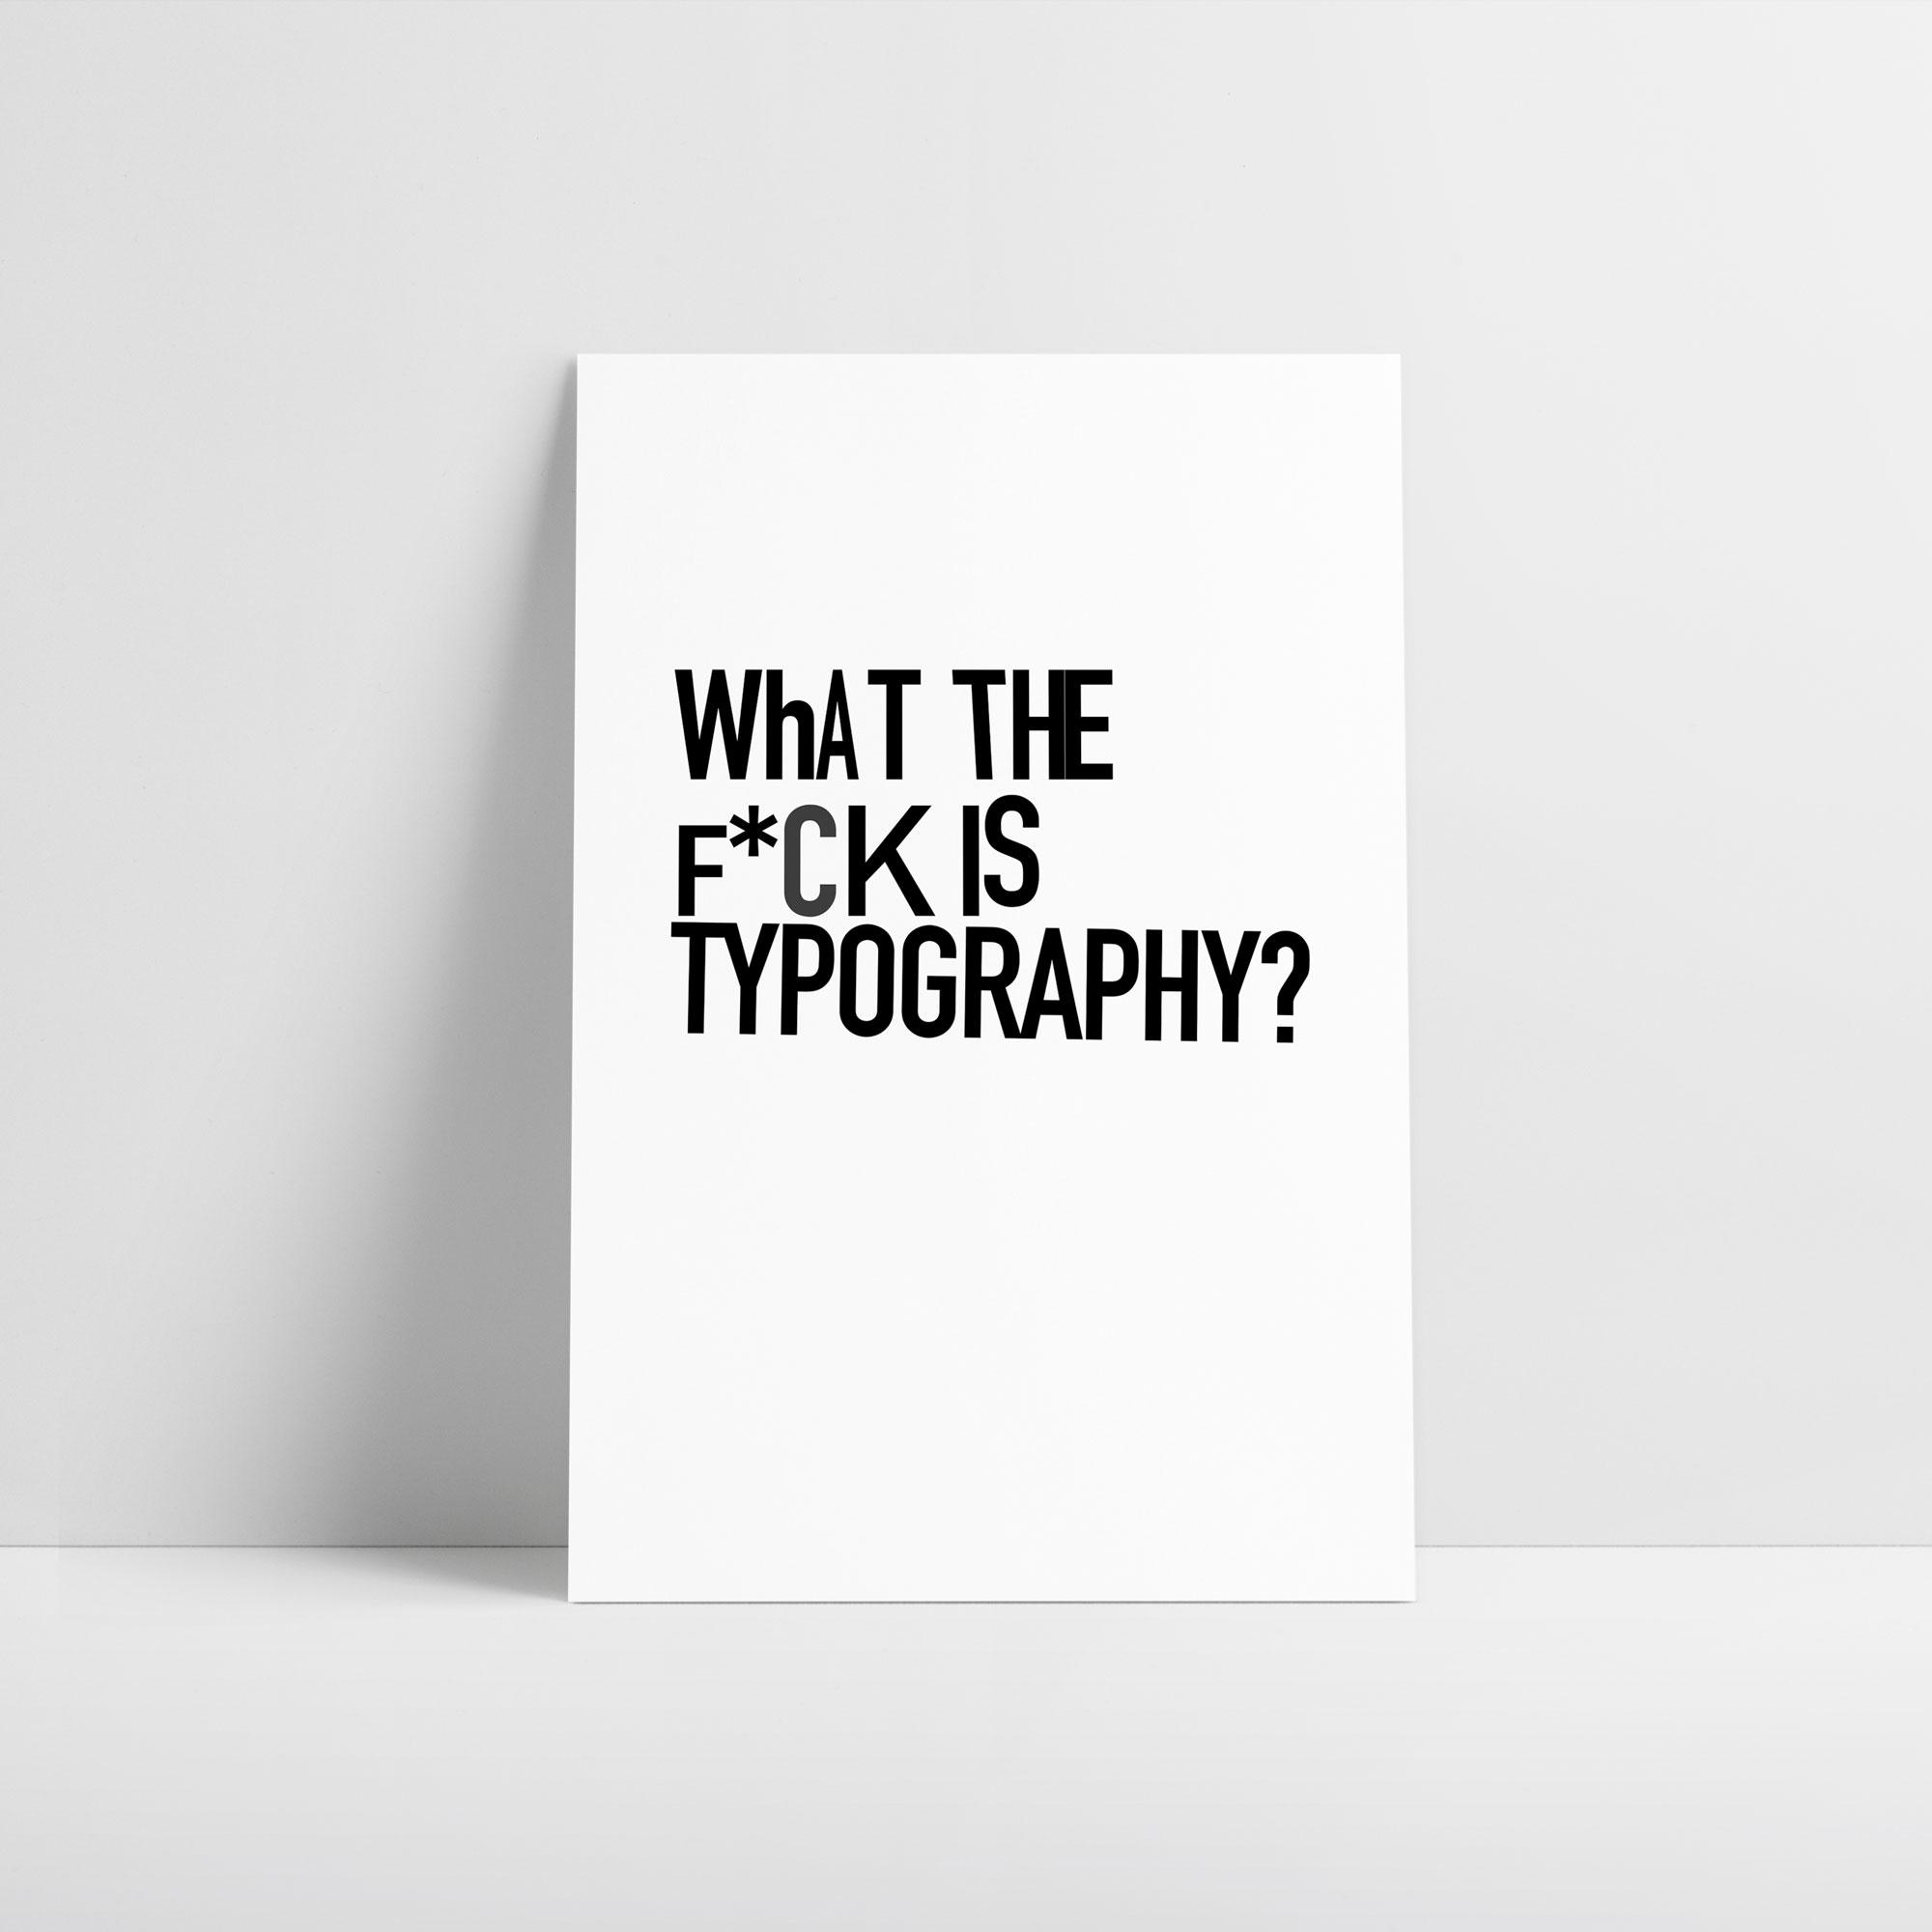 1313 multimedial Grafikdesign Poster Design Typographie